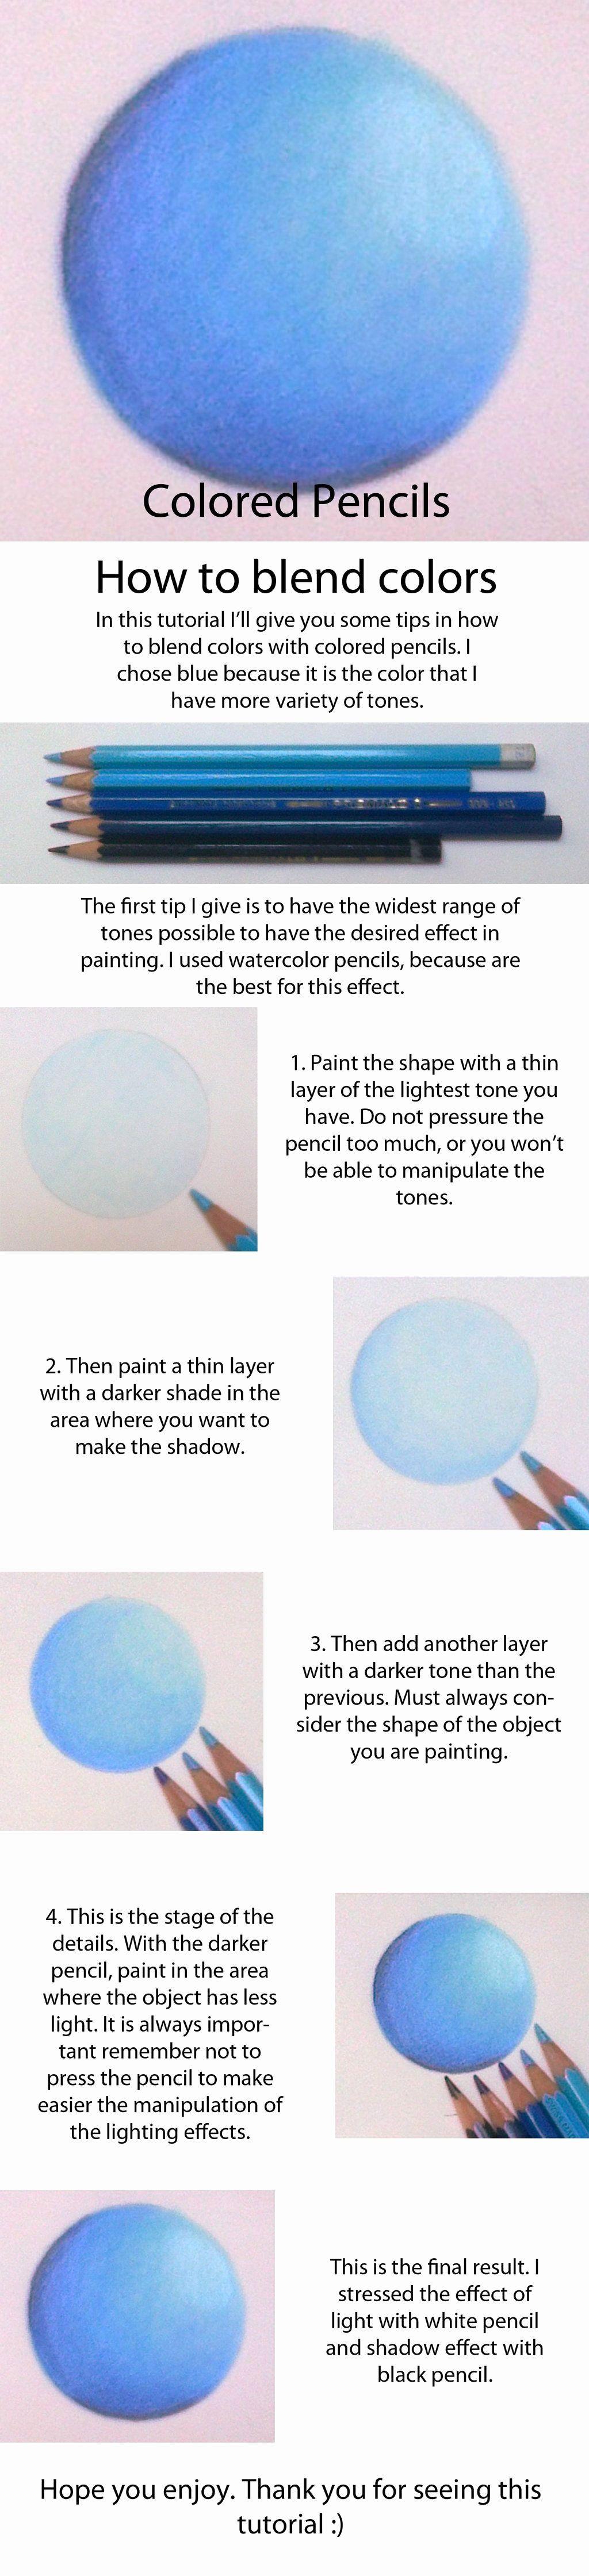 Coloring Techniques Colored Pencils